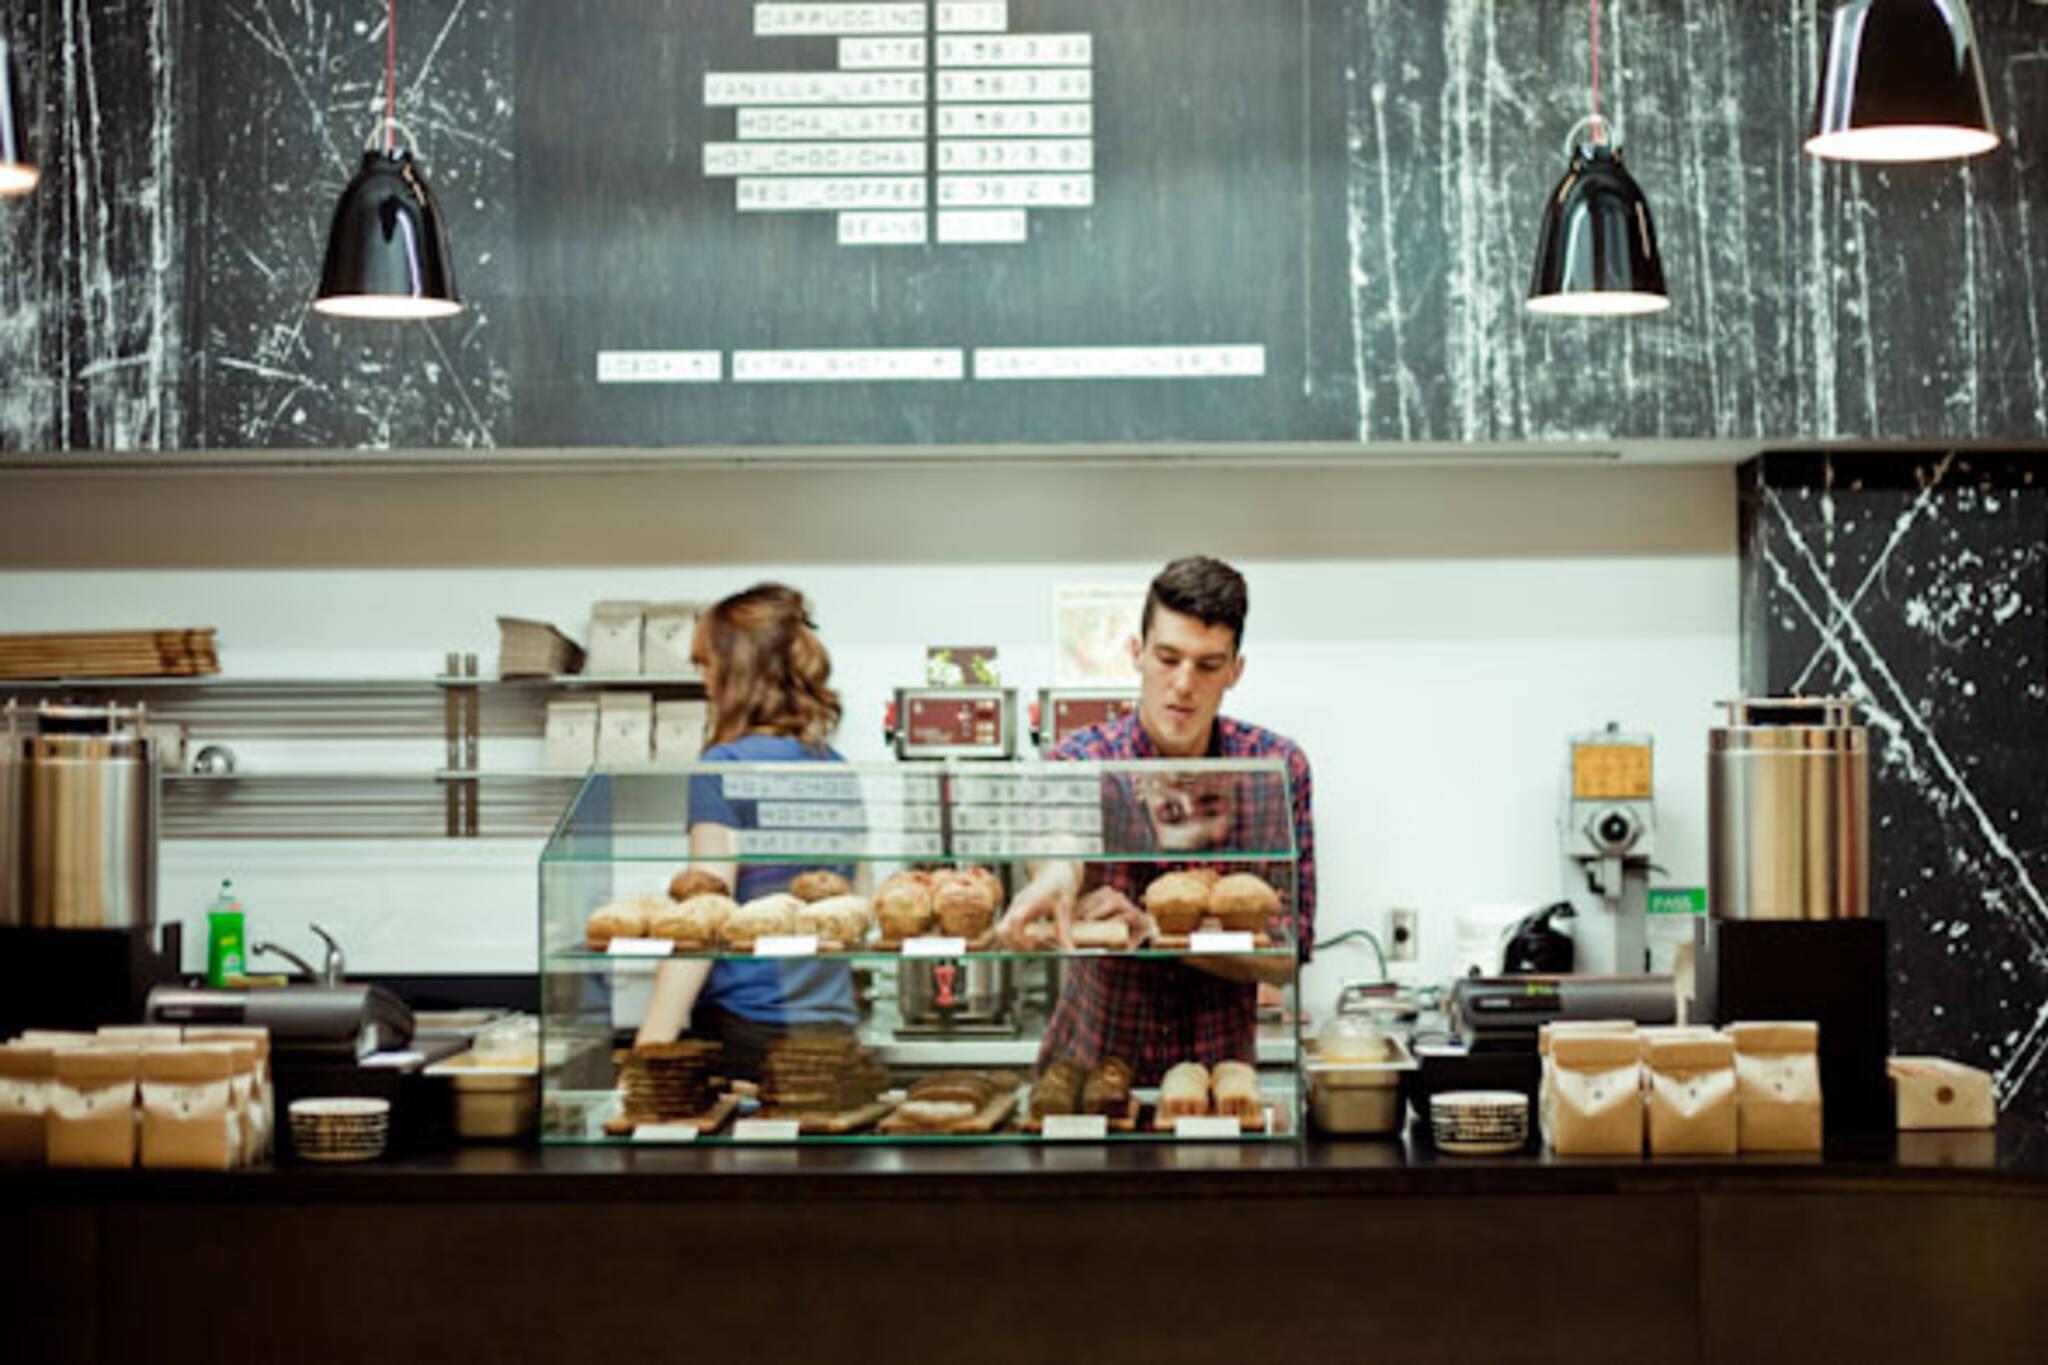 Coffee PATH Toronto